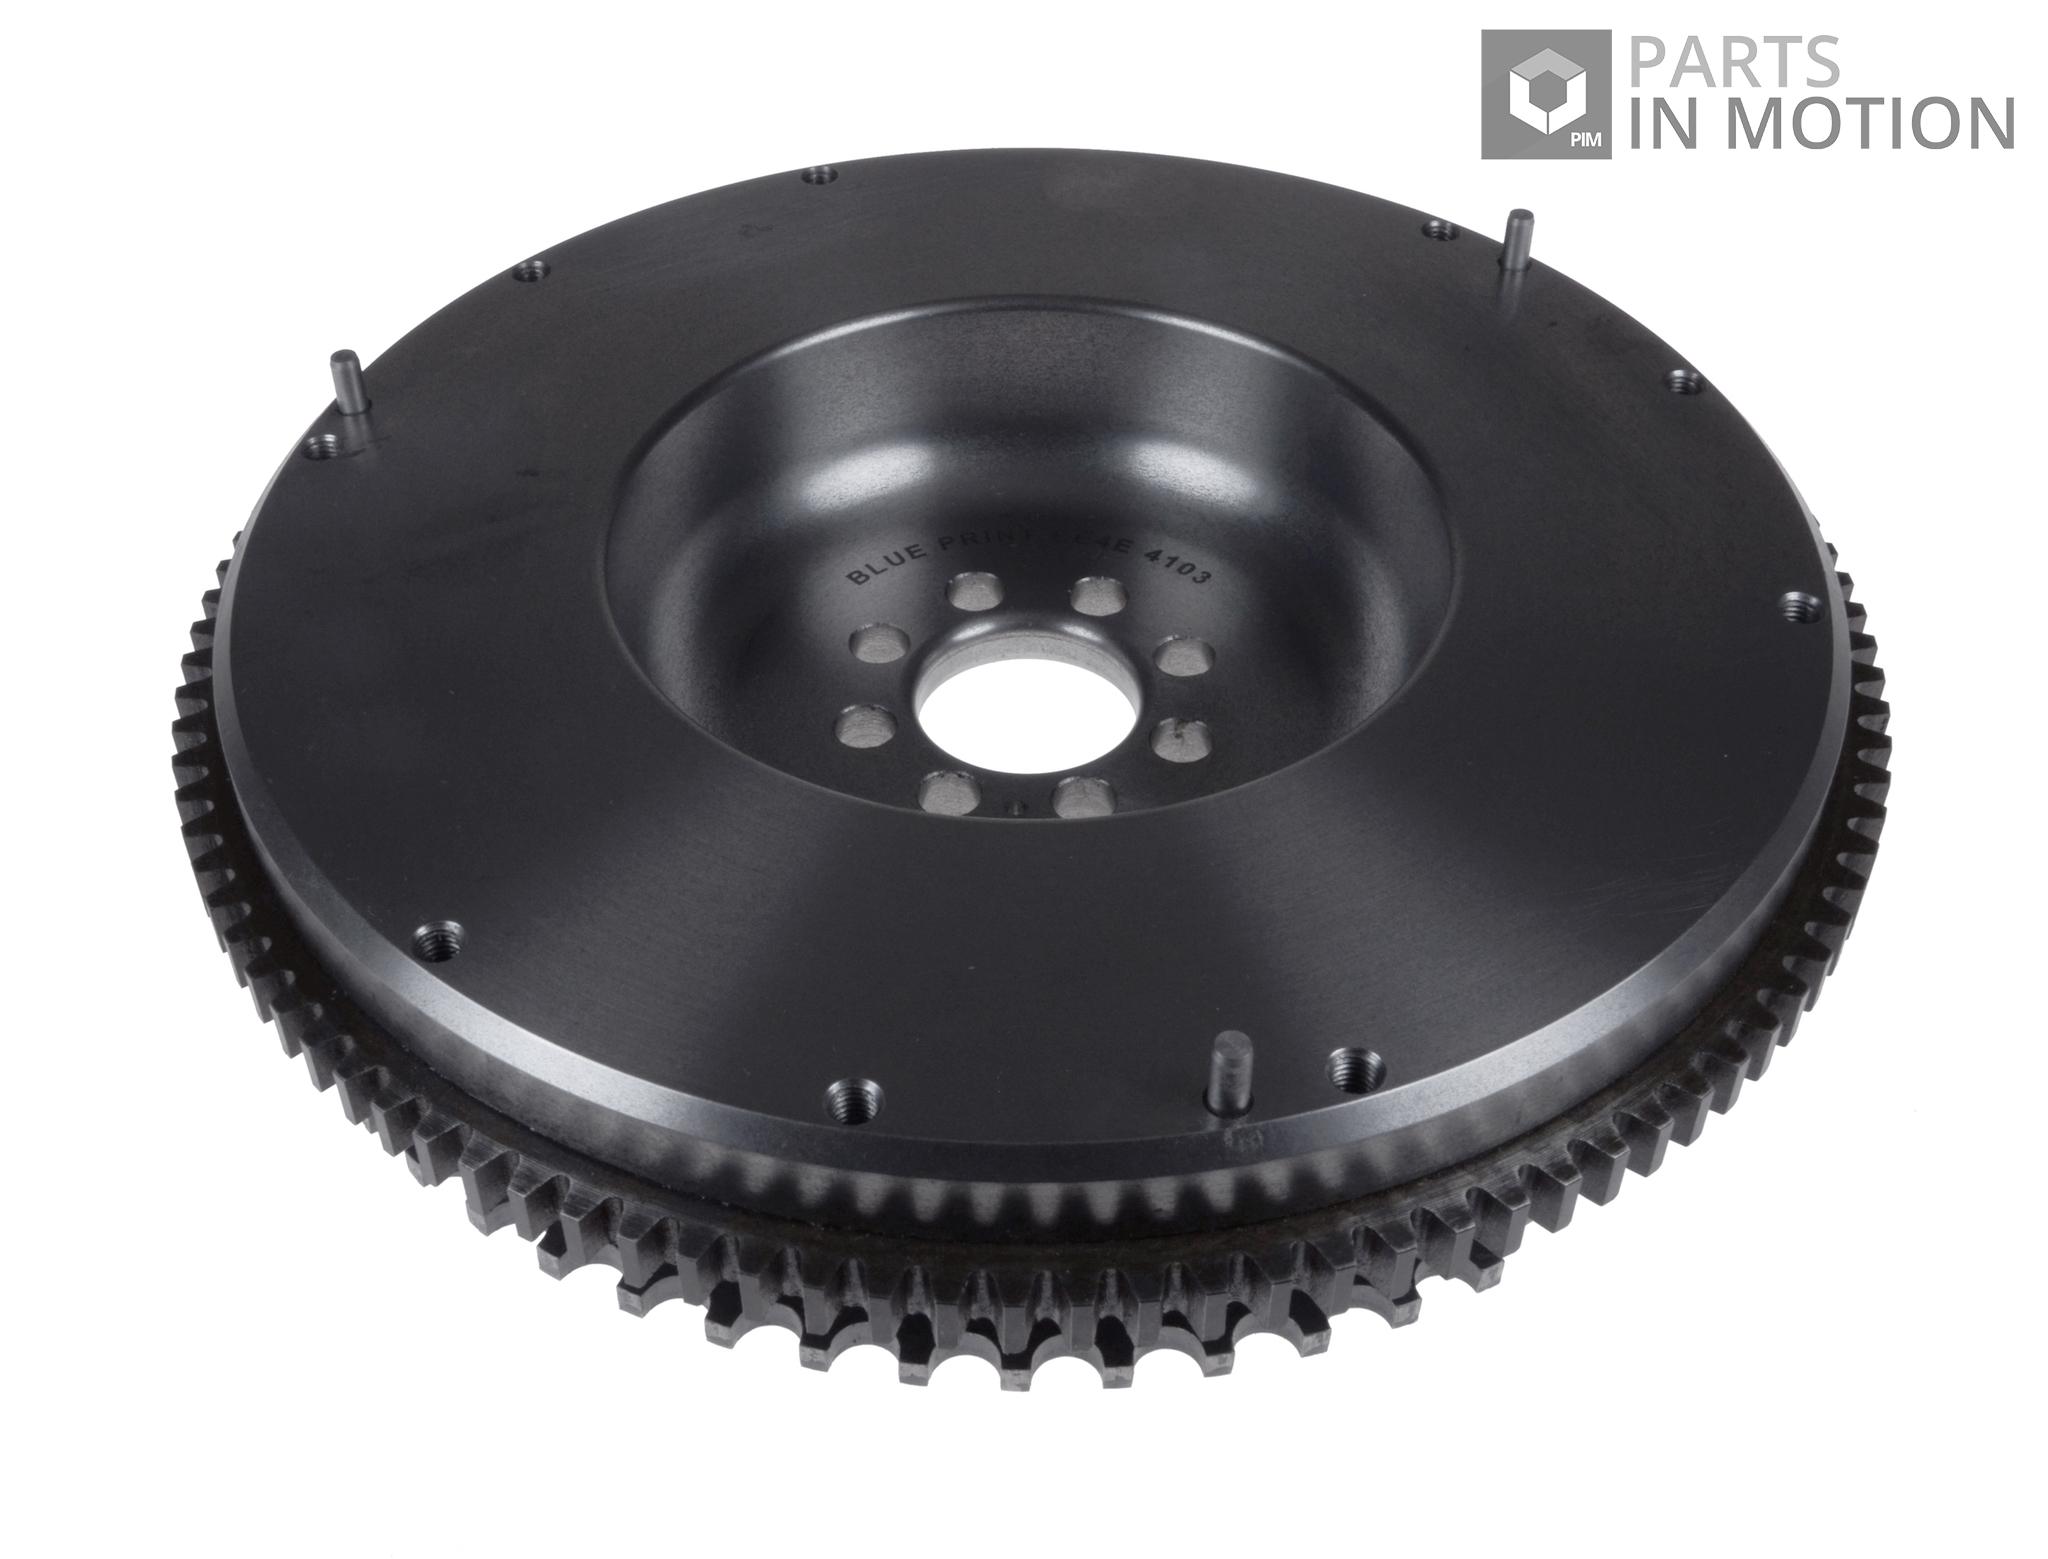 Single Mass Solid Flywheel ADN13519 Blue Print 12310EB30C Quality Replacement